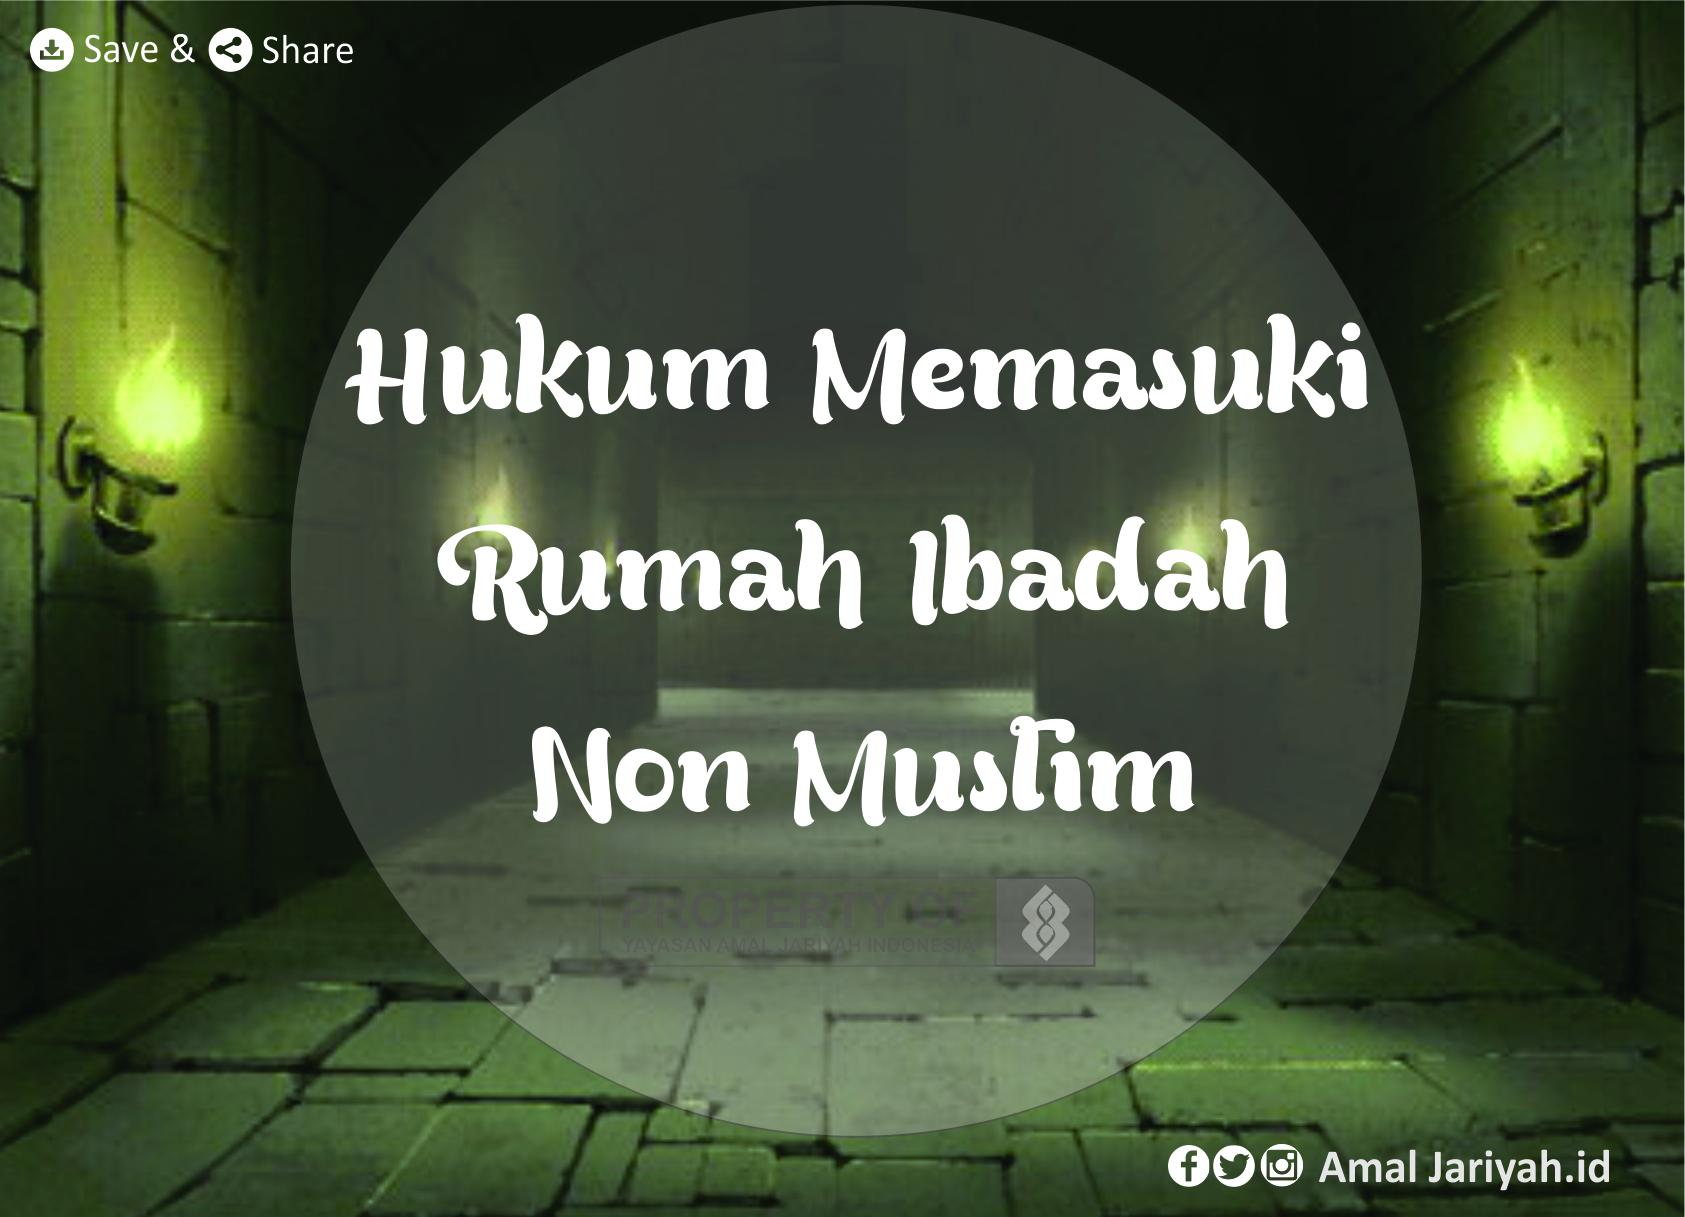 Hukum Memasuki Rumah Ibadah Non Muslim